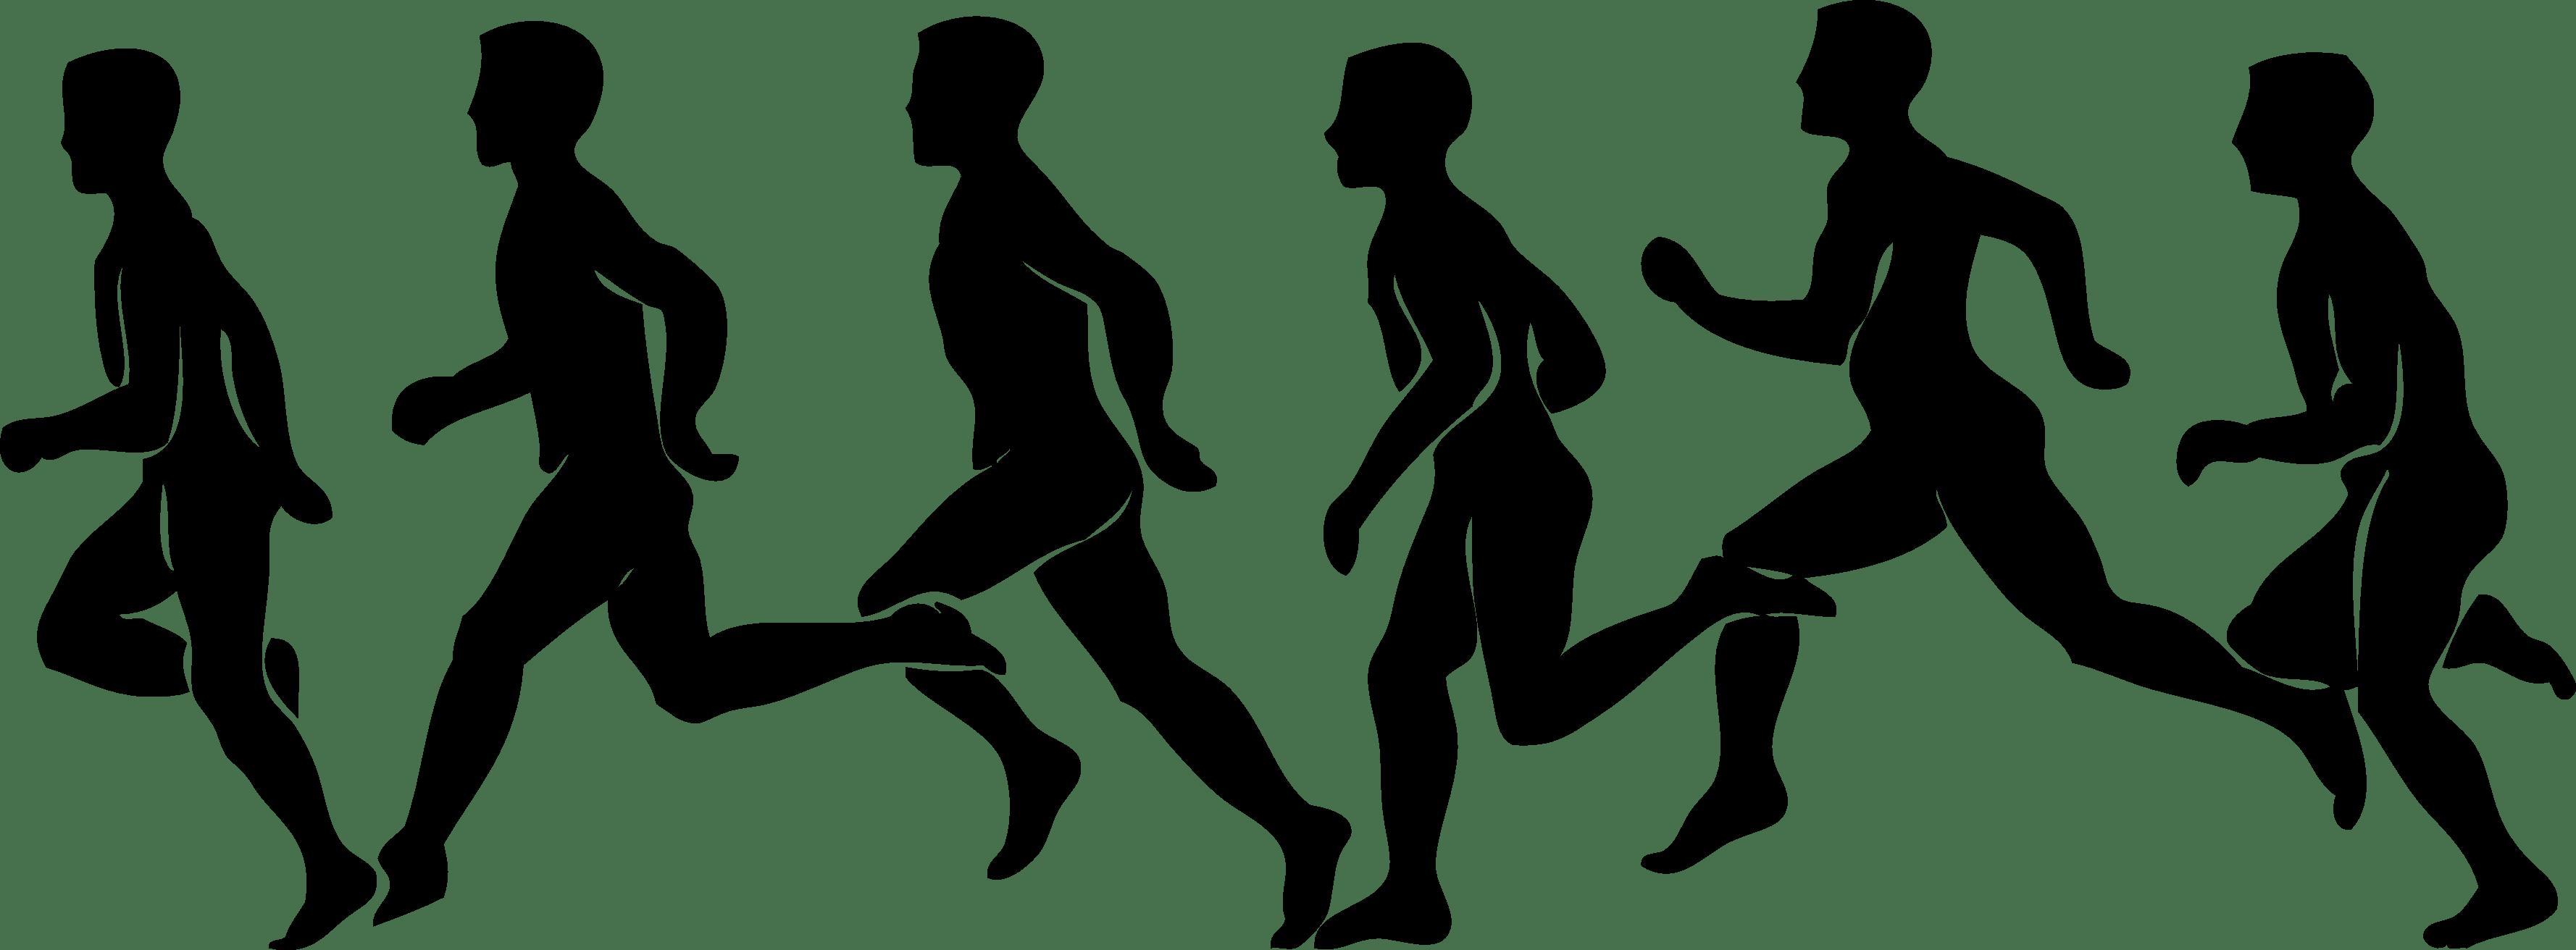 Marathon running clipart jpg free stock Marathon run clipart » Clipart Portal jpg free stock